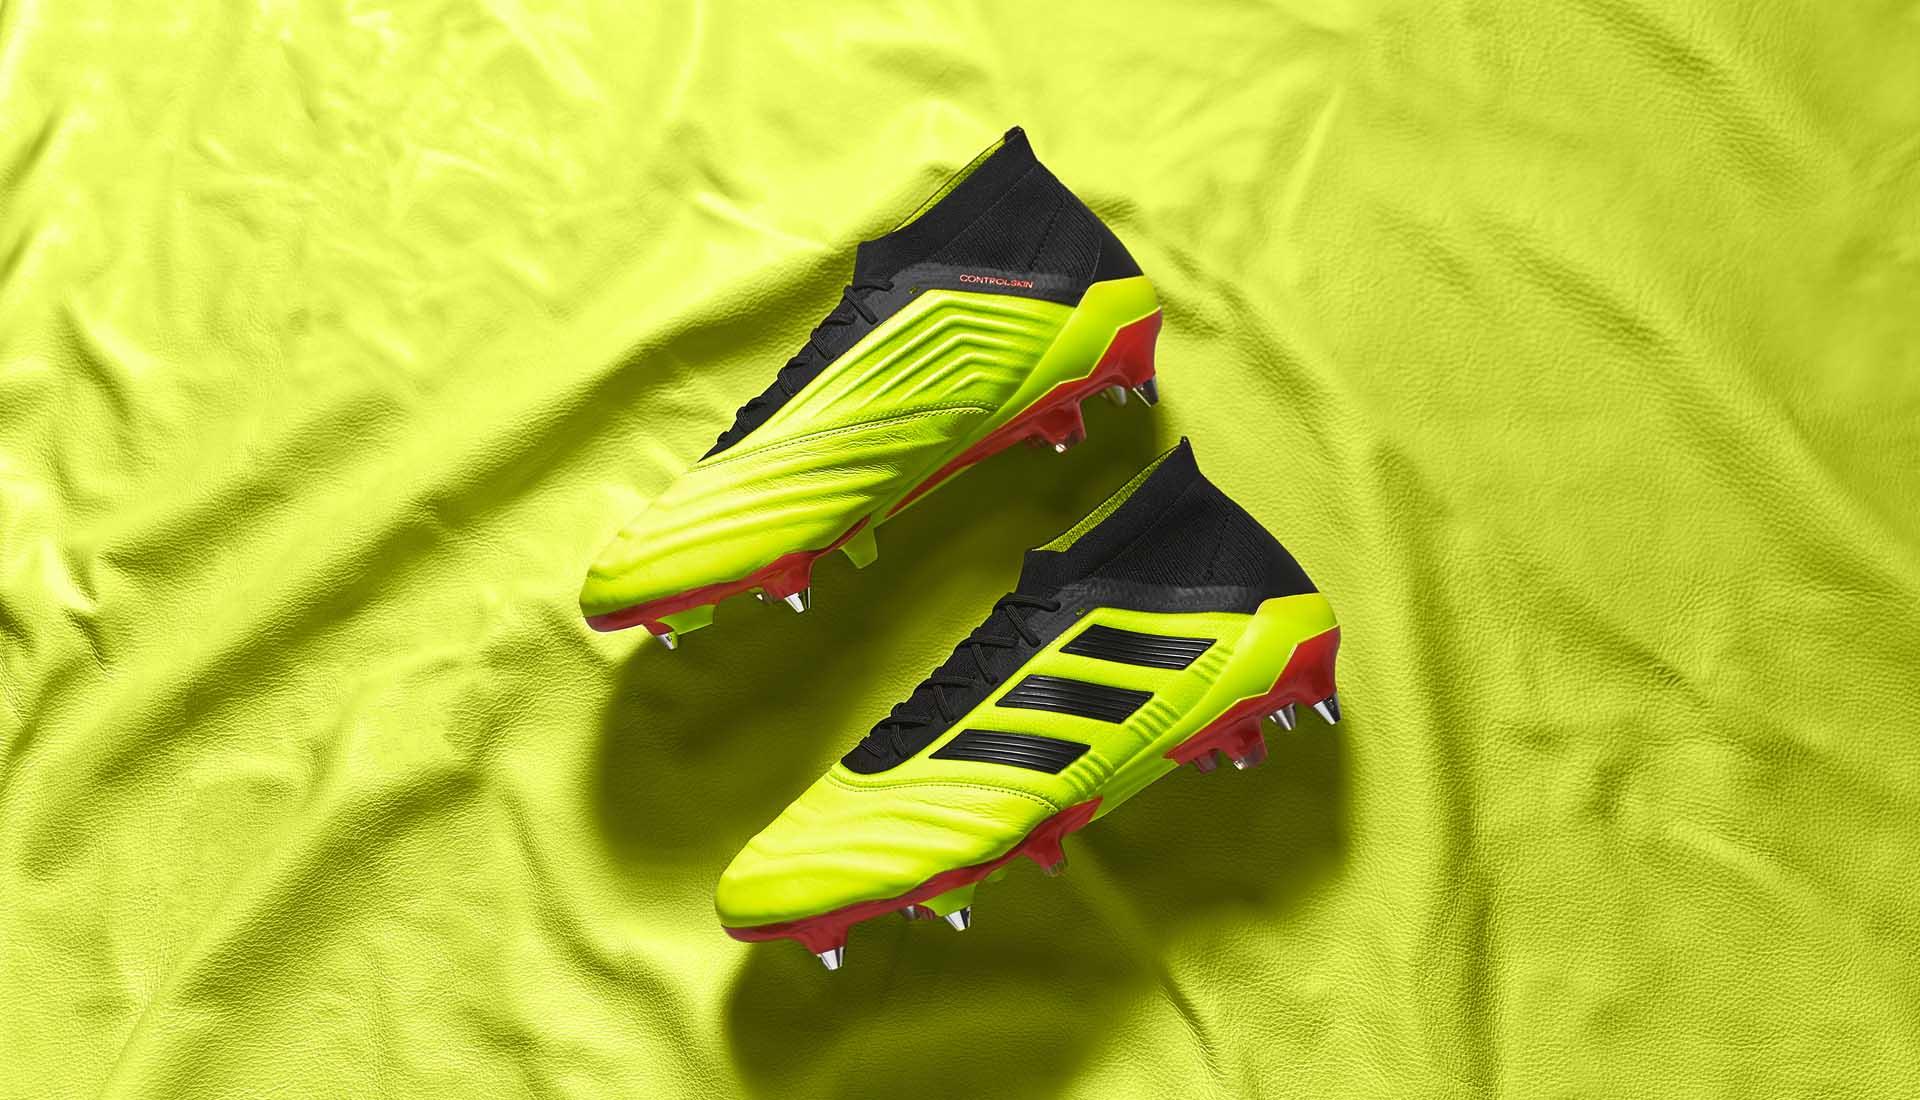 cae147f64 6-leather-predator-18-collection-min.jpg. The adidas Predator 18.1 ...